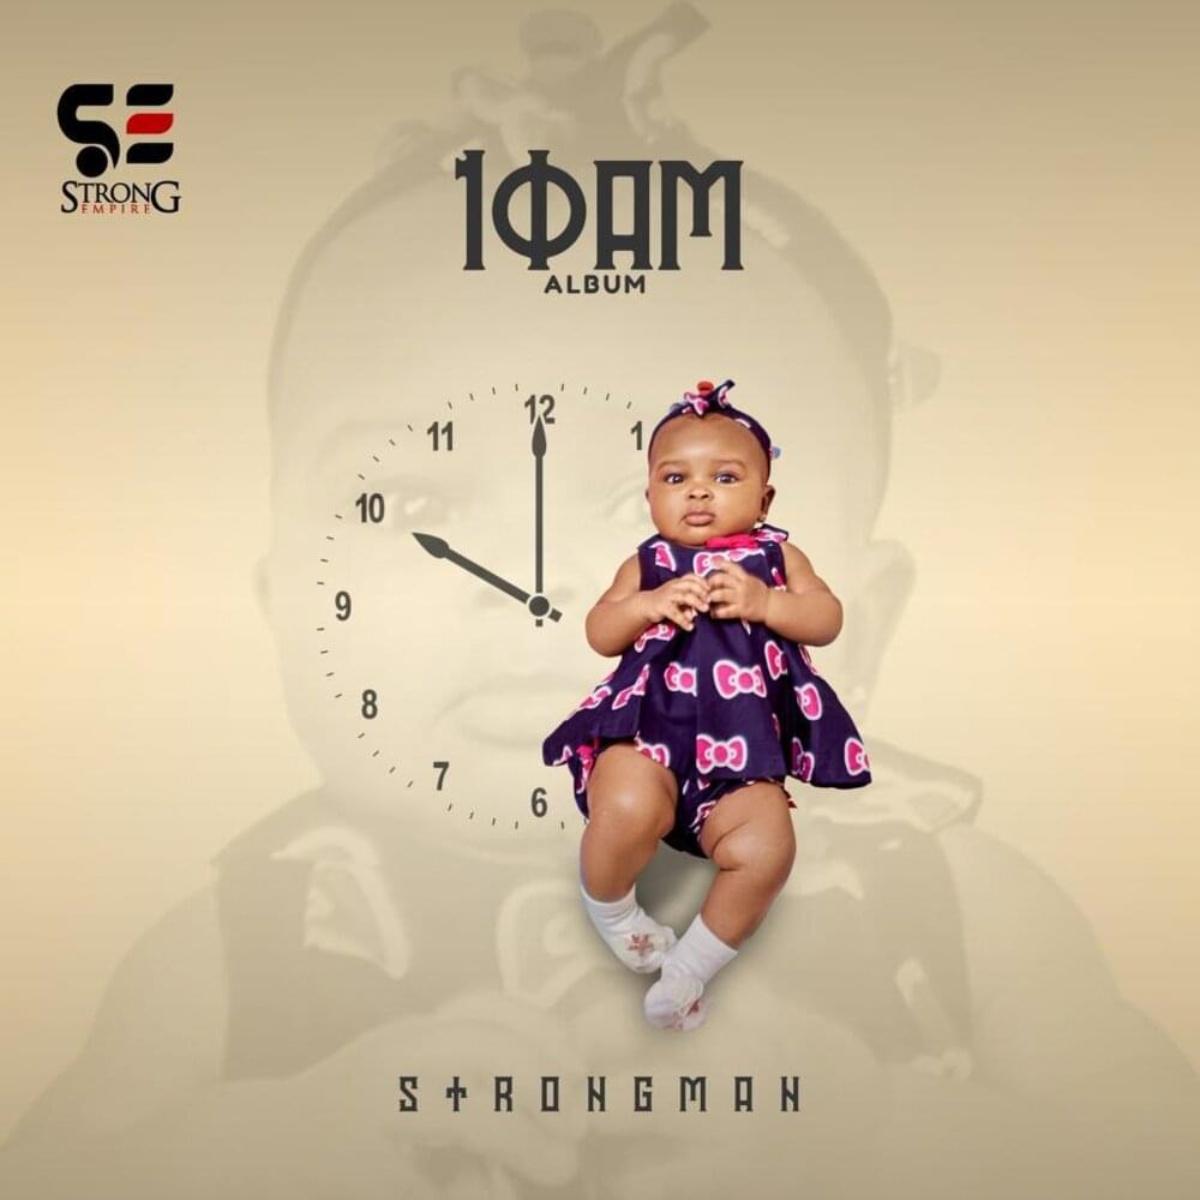 ALBUM: 10 AM BY STRONGMAN